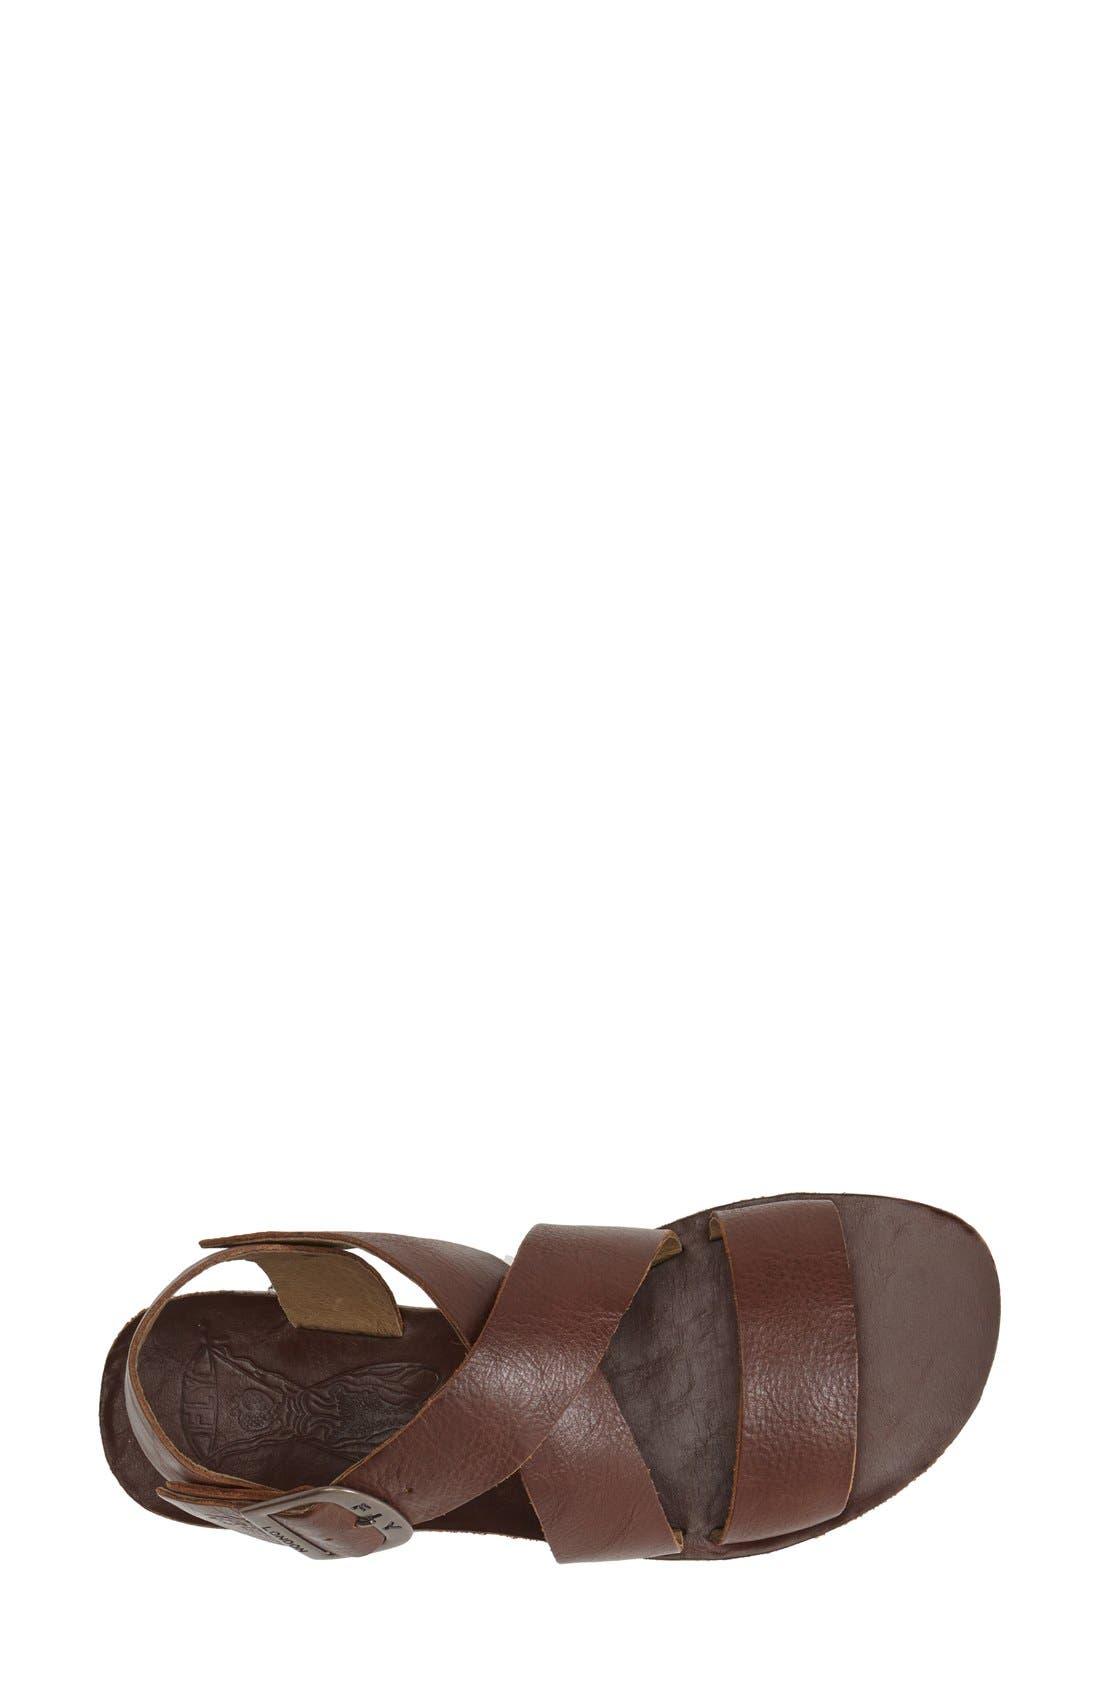 Alternate Image 3  - Fly London 'Bian' Flat Leather Sandal (Women)